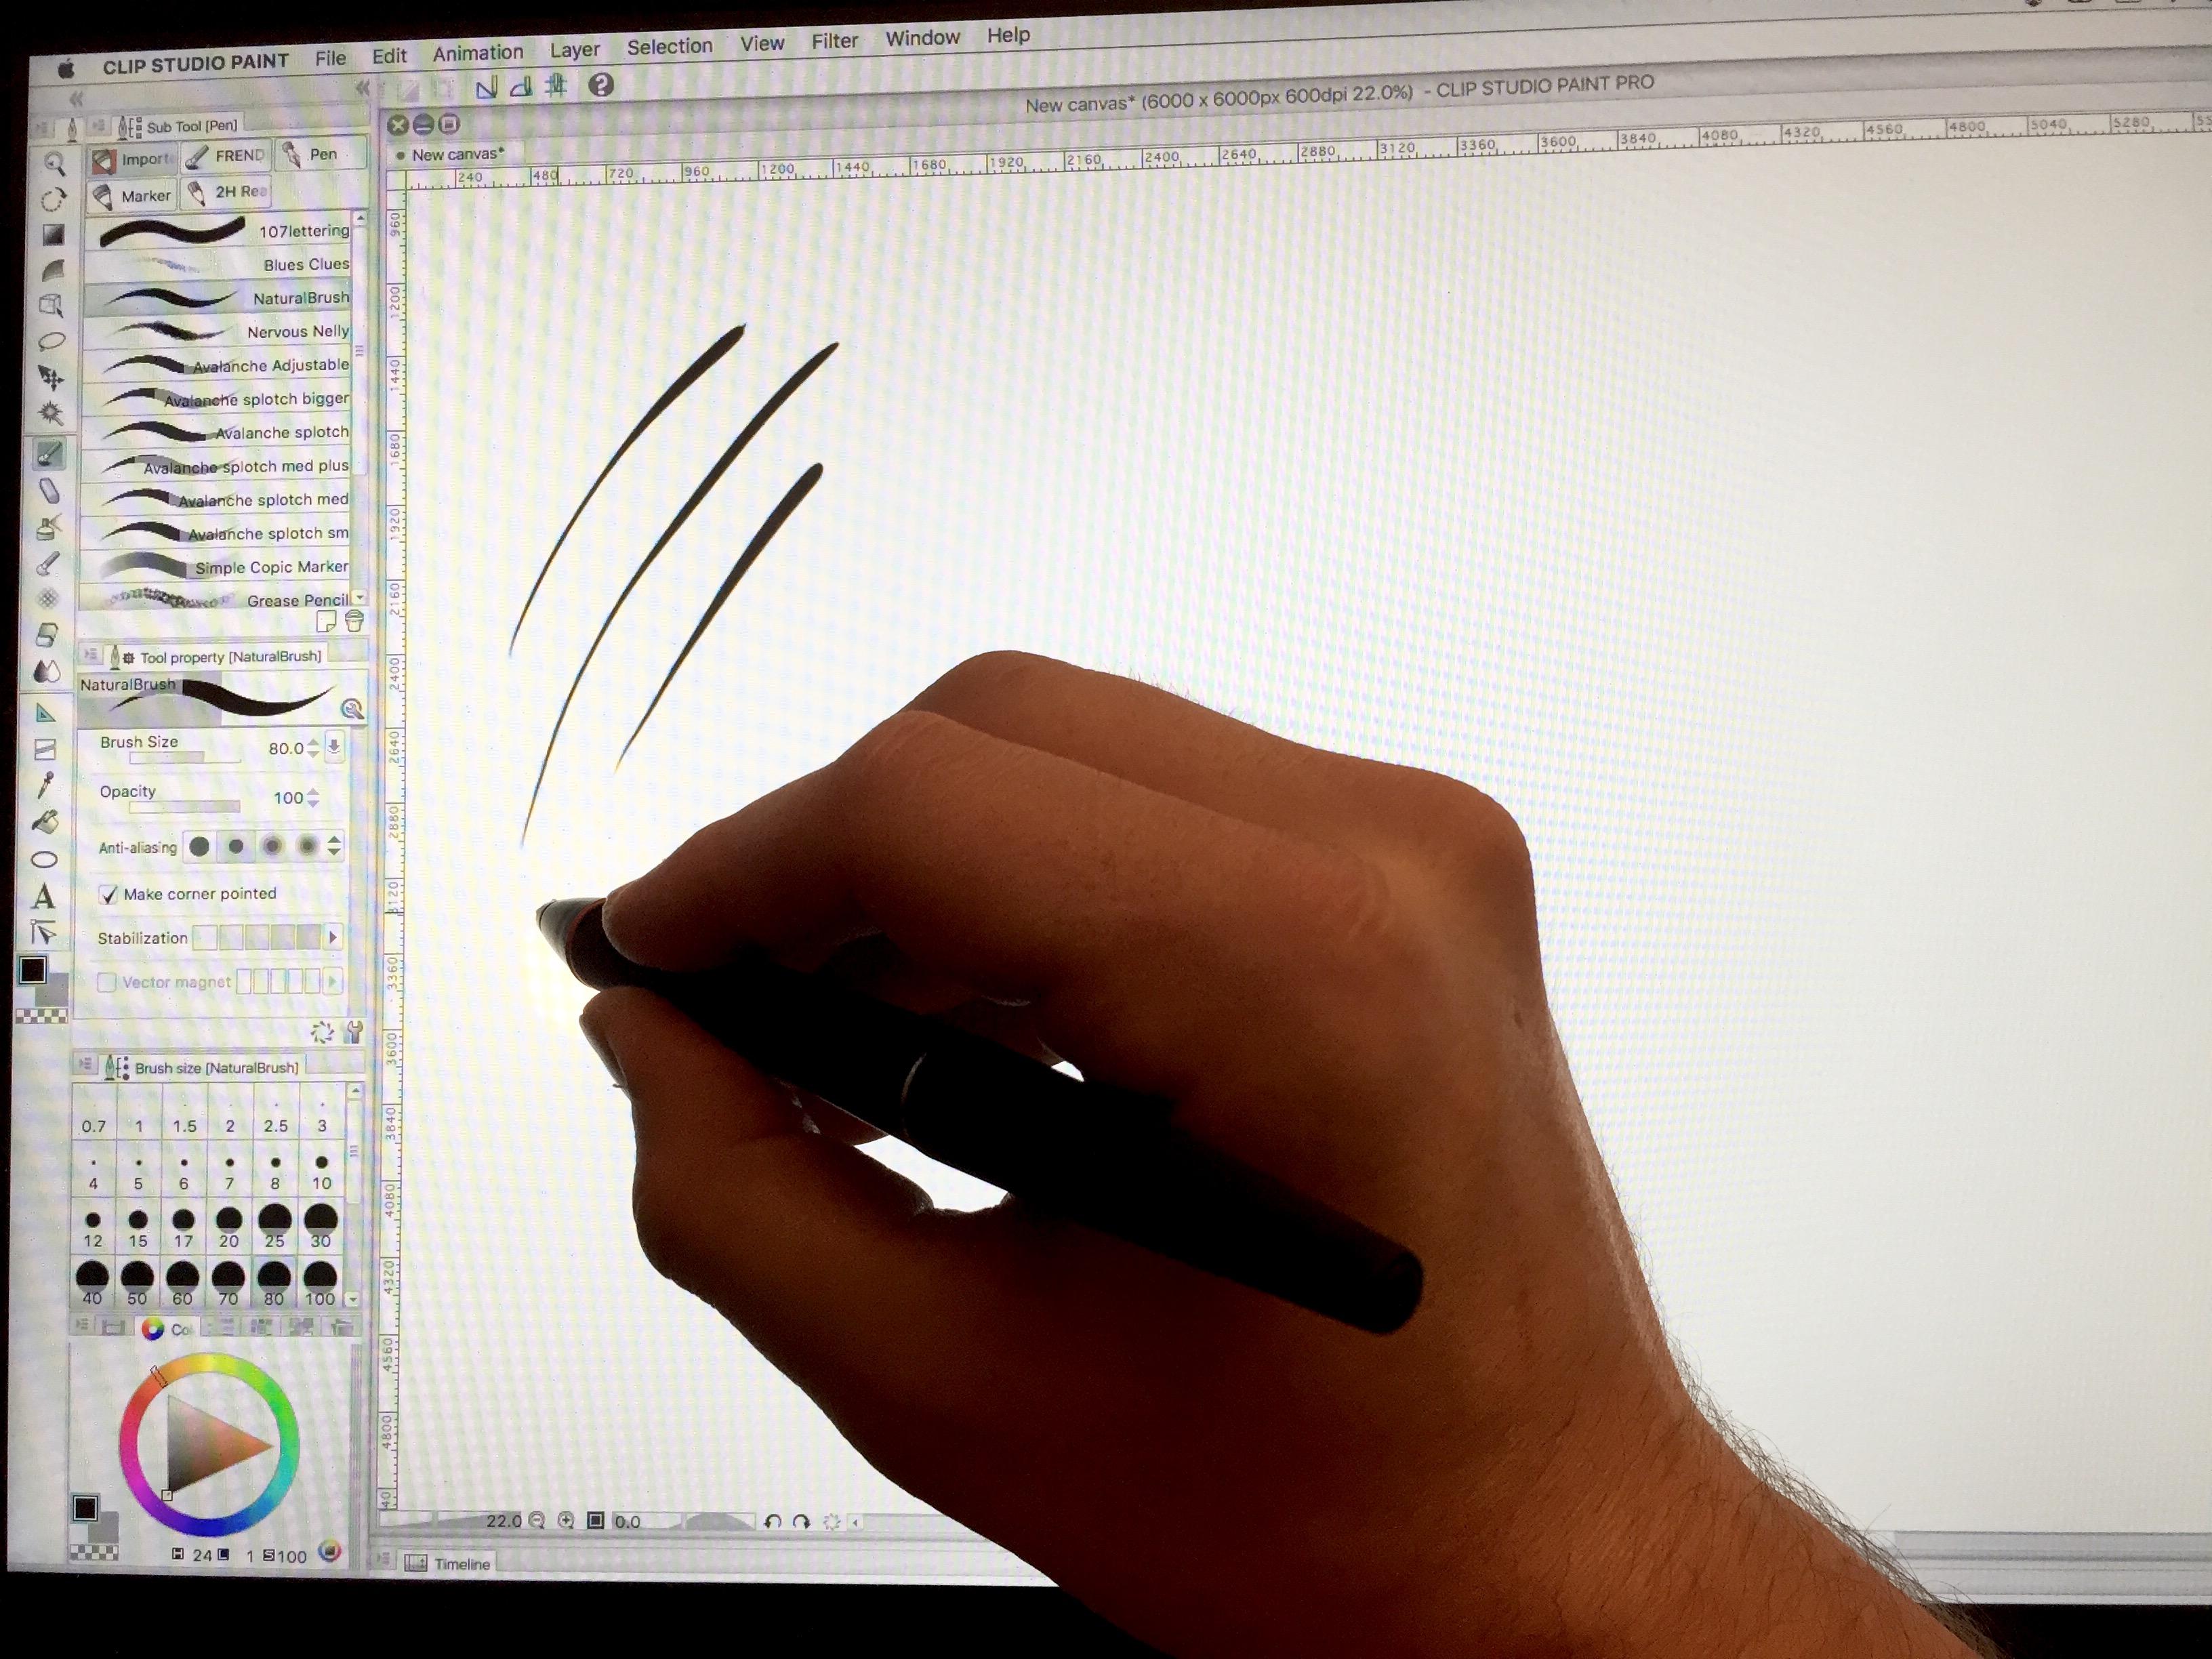 wacom intuos manga clip studio paint pro